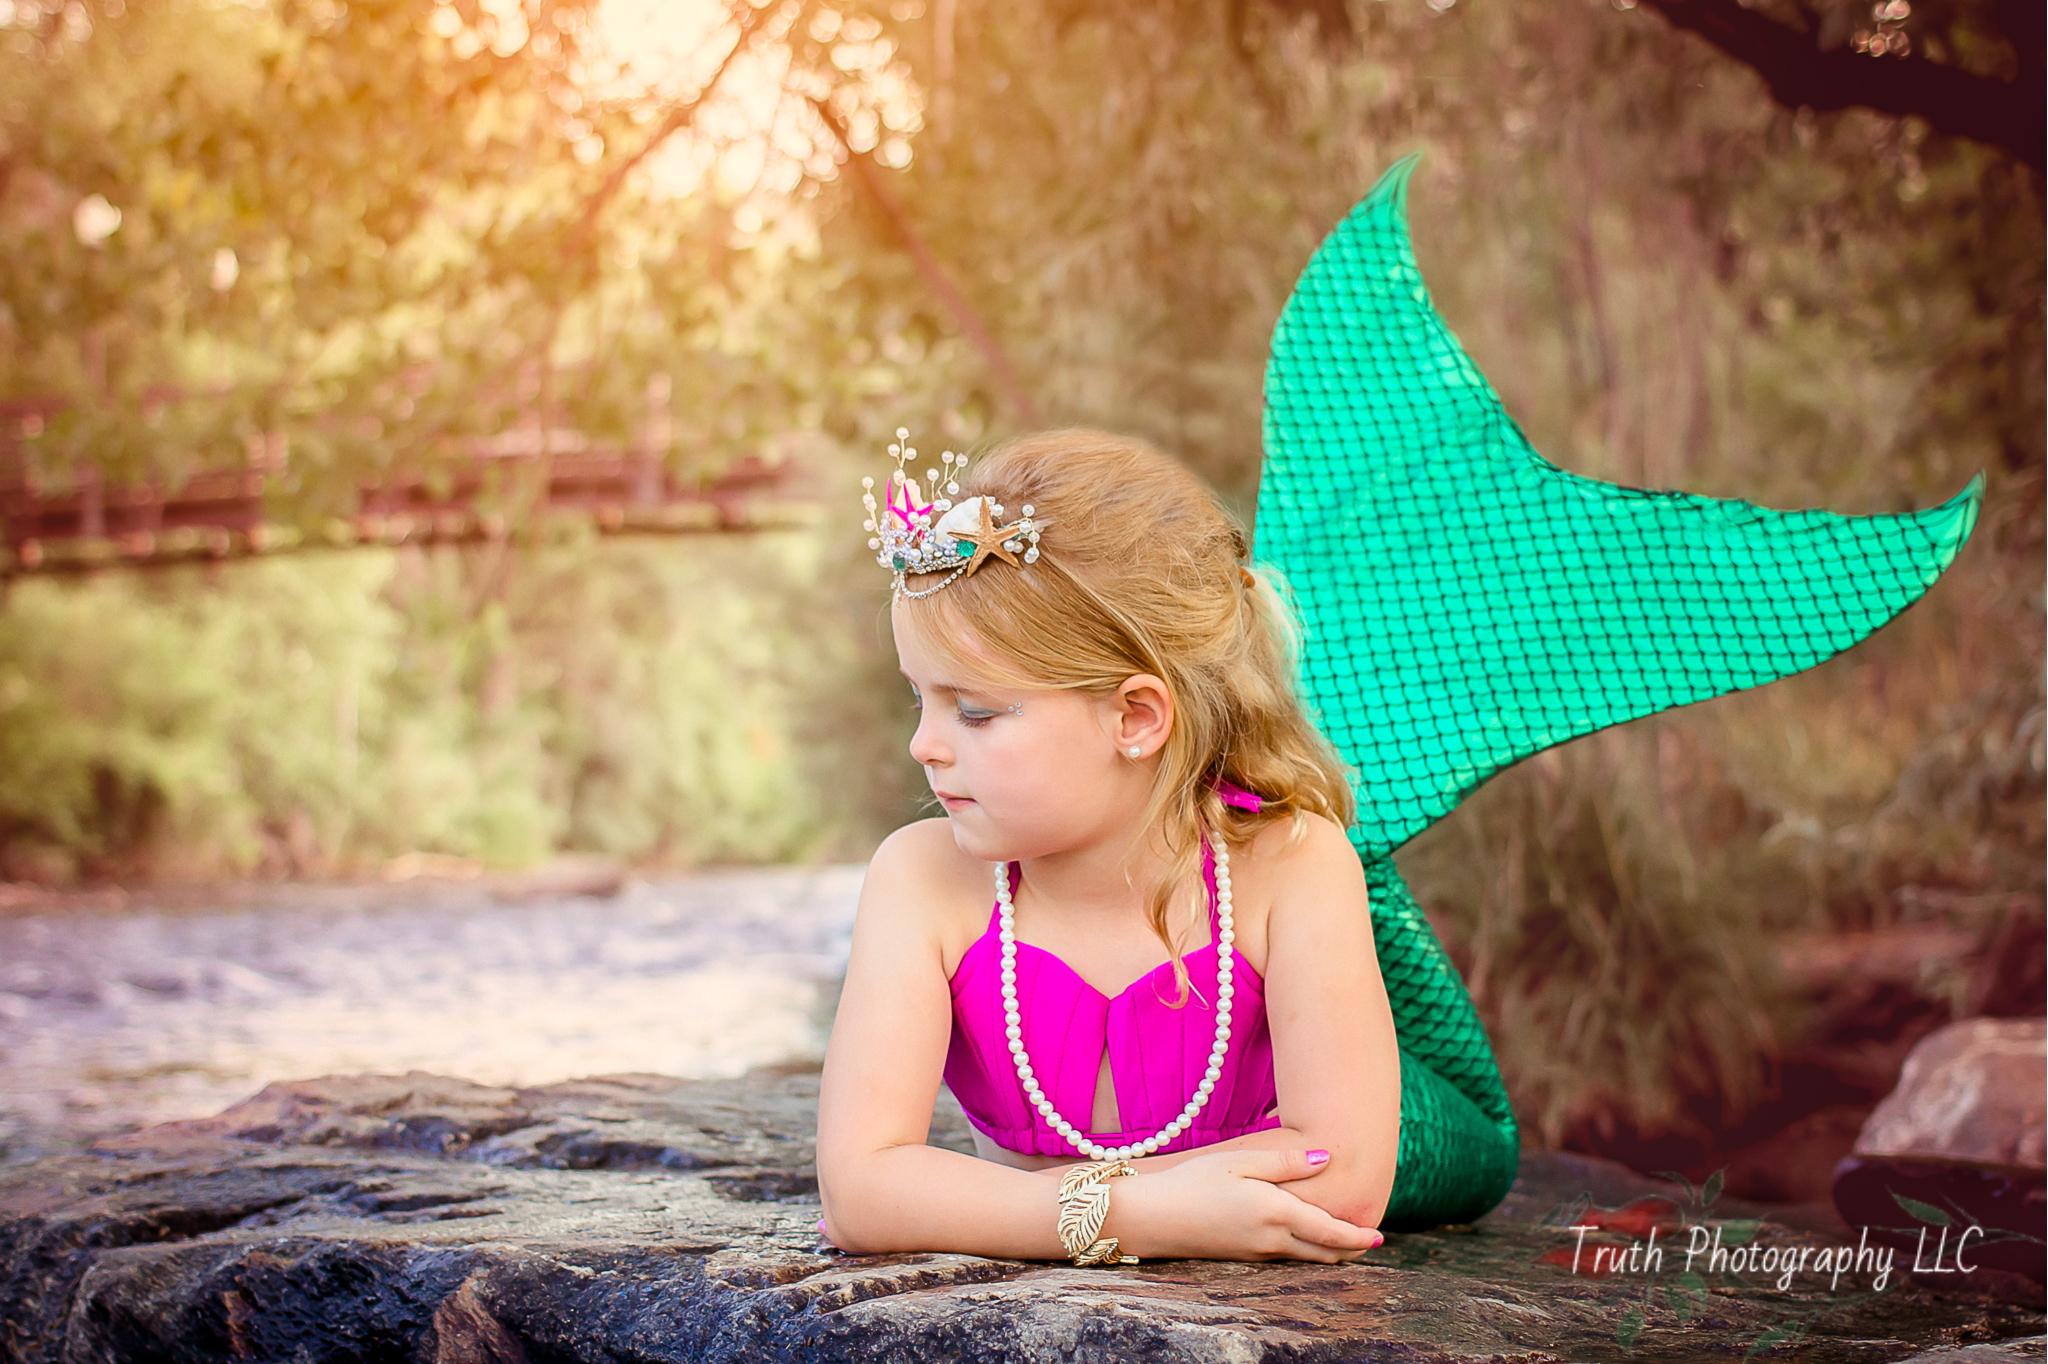 Truth-Photography-Denver-CO-mermaid-photo.jpg